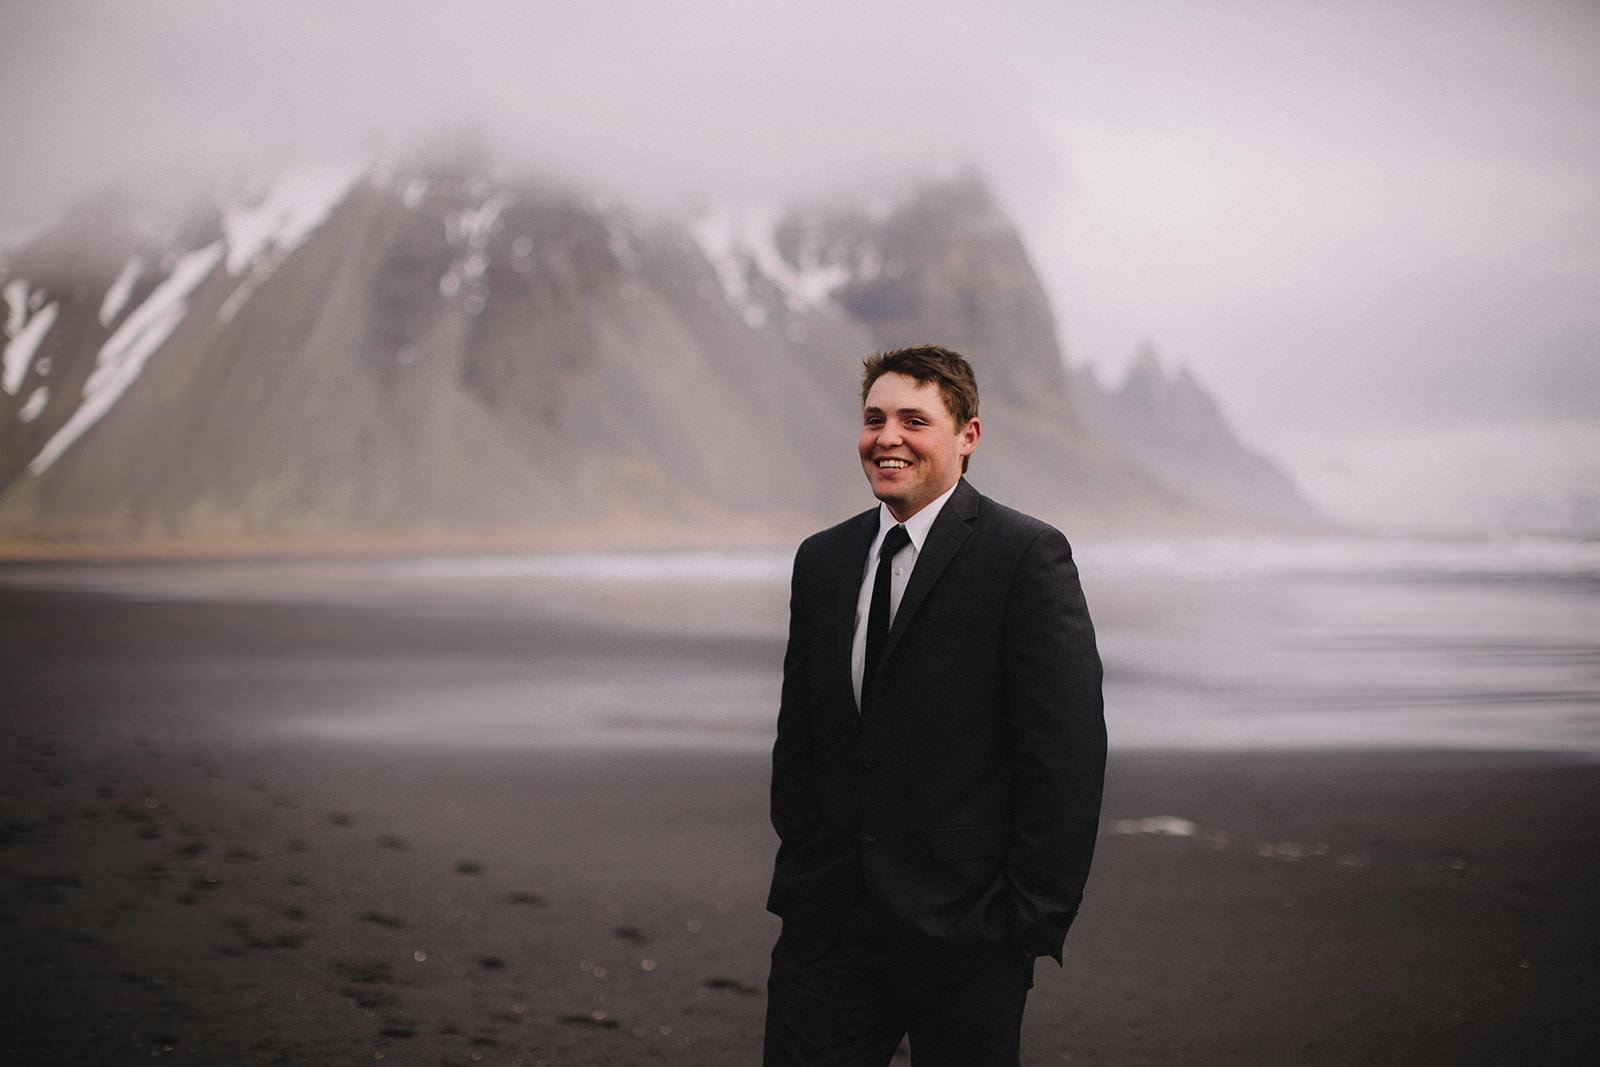 Icelandic Iceland Elopement Wedding Elope Photographer Eloping Reykjavík Vik Black Sand Beach Jökulsárlón Skogafoss Waterfall Vestrahorn Mountain Liz Osban Photography Destination 45.jpg